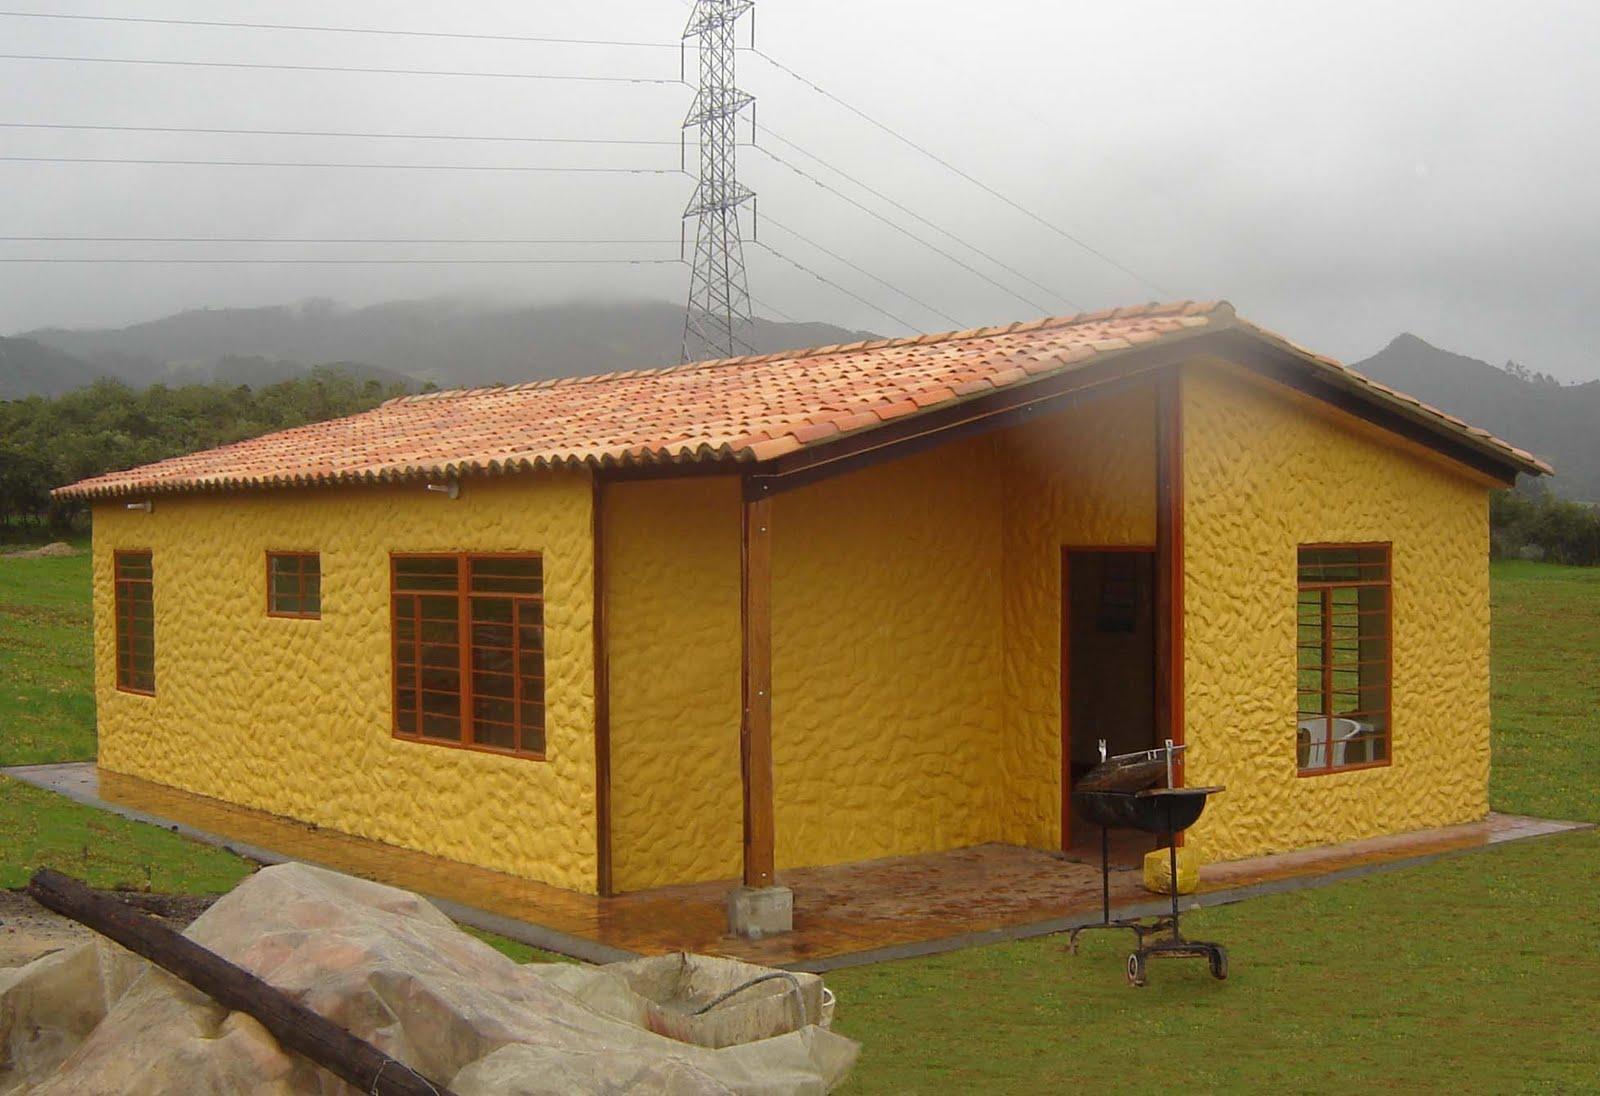 Casas prefabricadas creando viviendas sas - Casas de prefabricadas ...